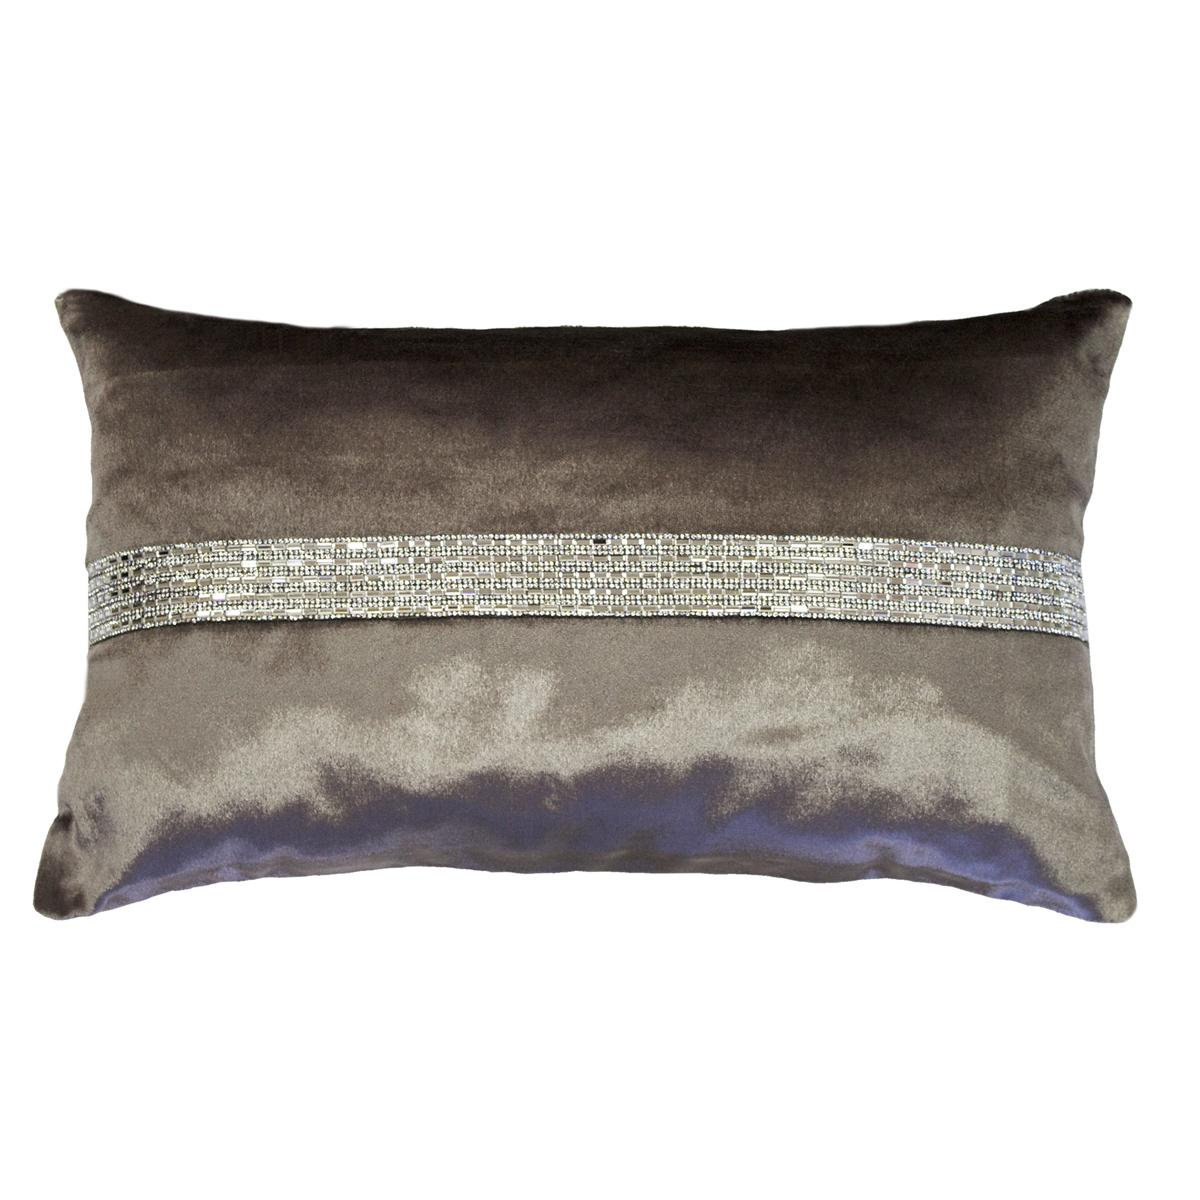 Grey Kylie Minogue Clauda Kitten Boudoir Cushion